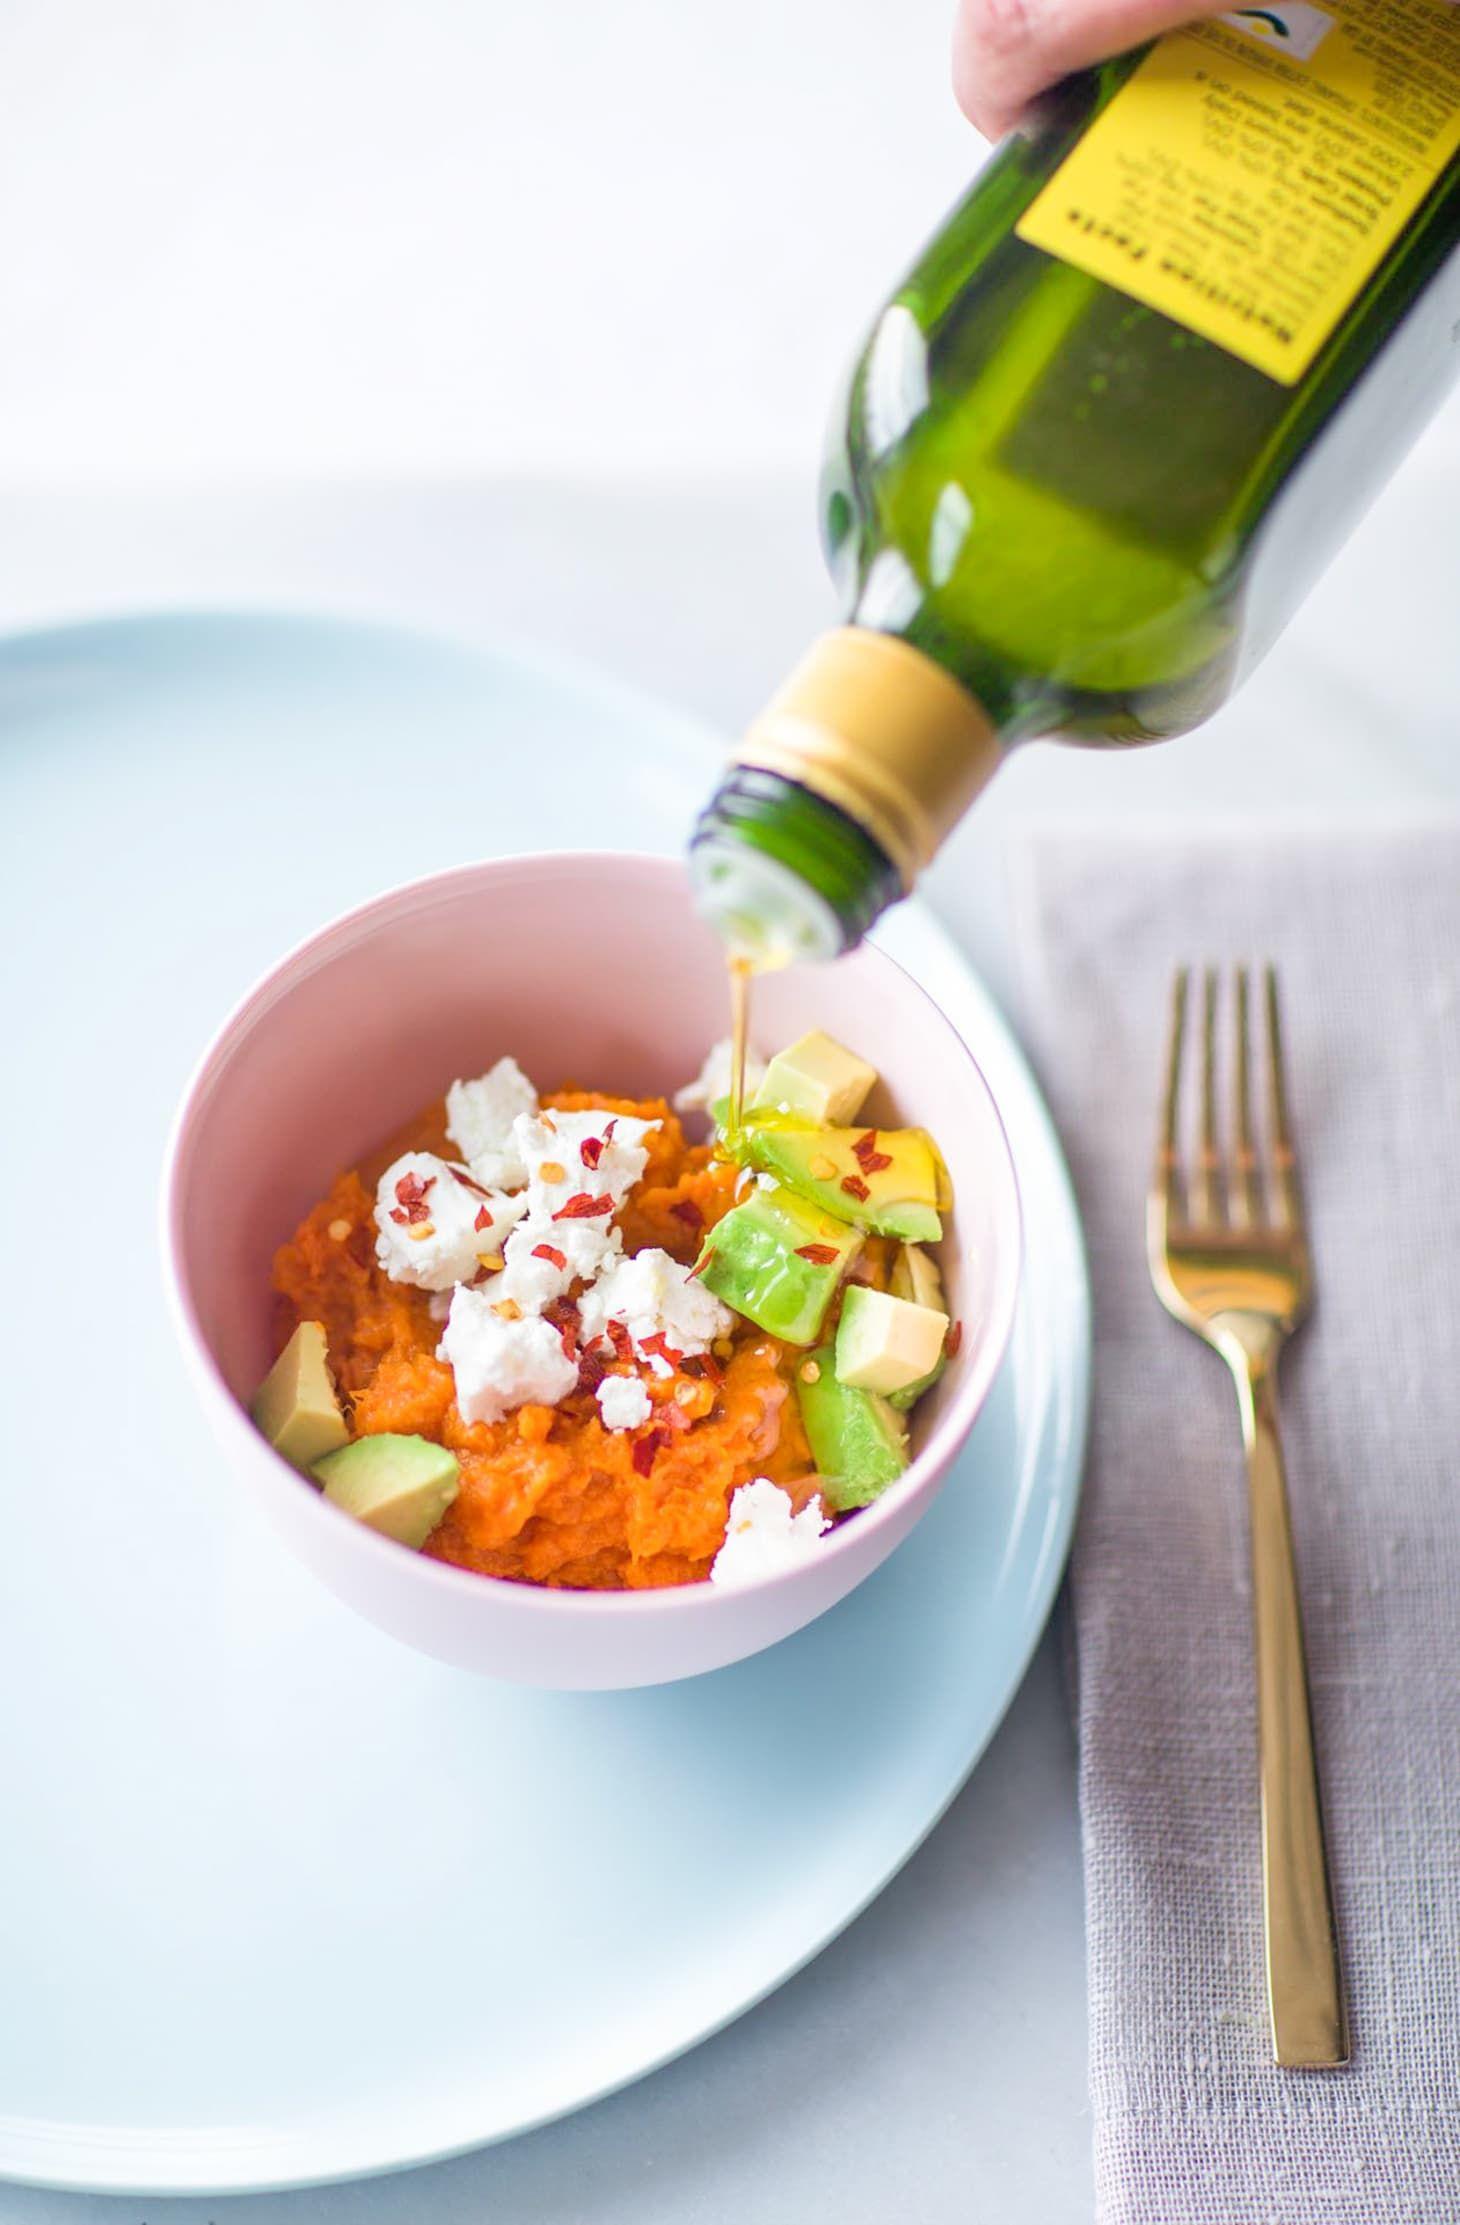 Recipe Mashed Sweet Potato Bowls Two Ways, for Mama